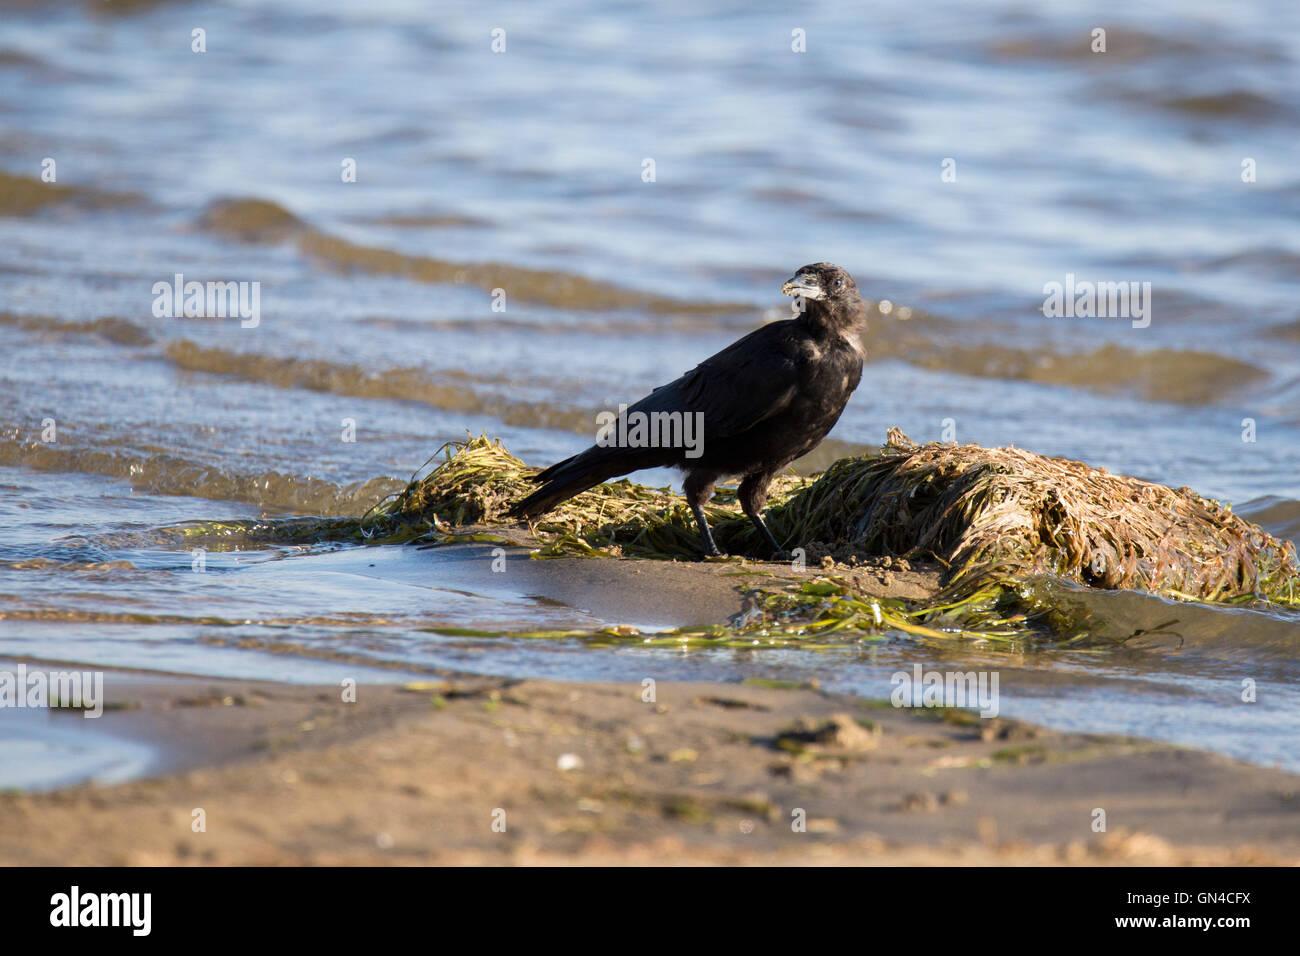 Amerikanische Krähe (Corvus Brachyrhynchos) Trinkwasser Stockbild